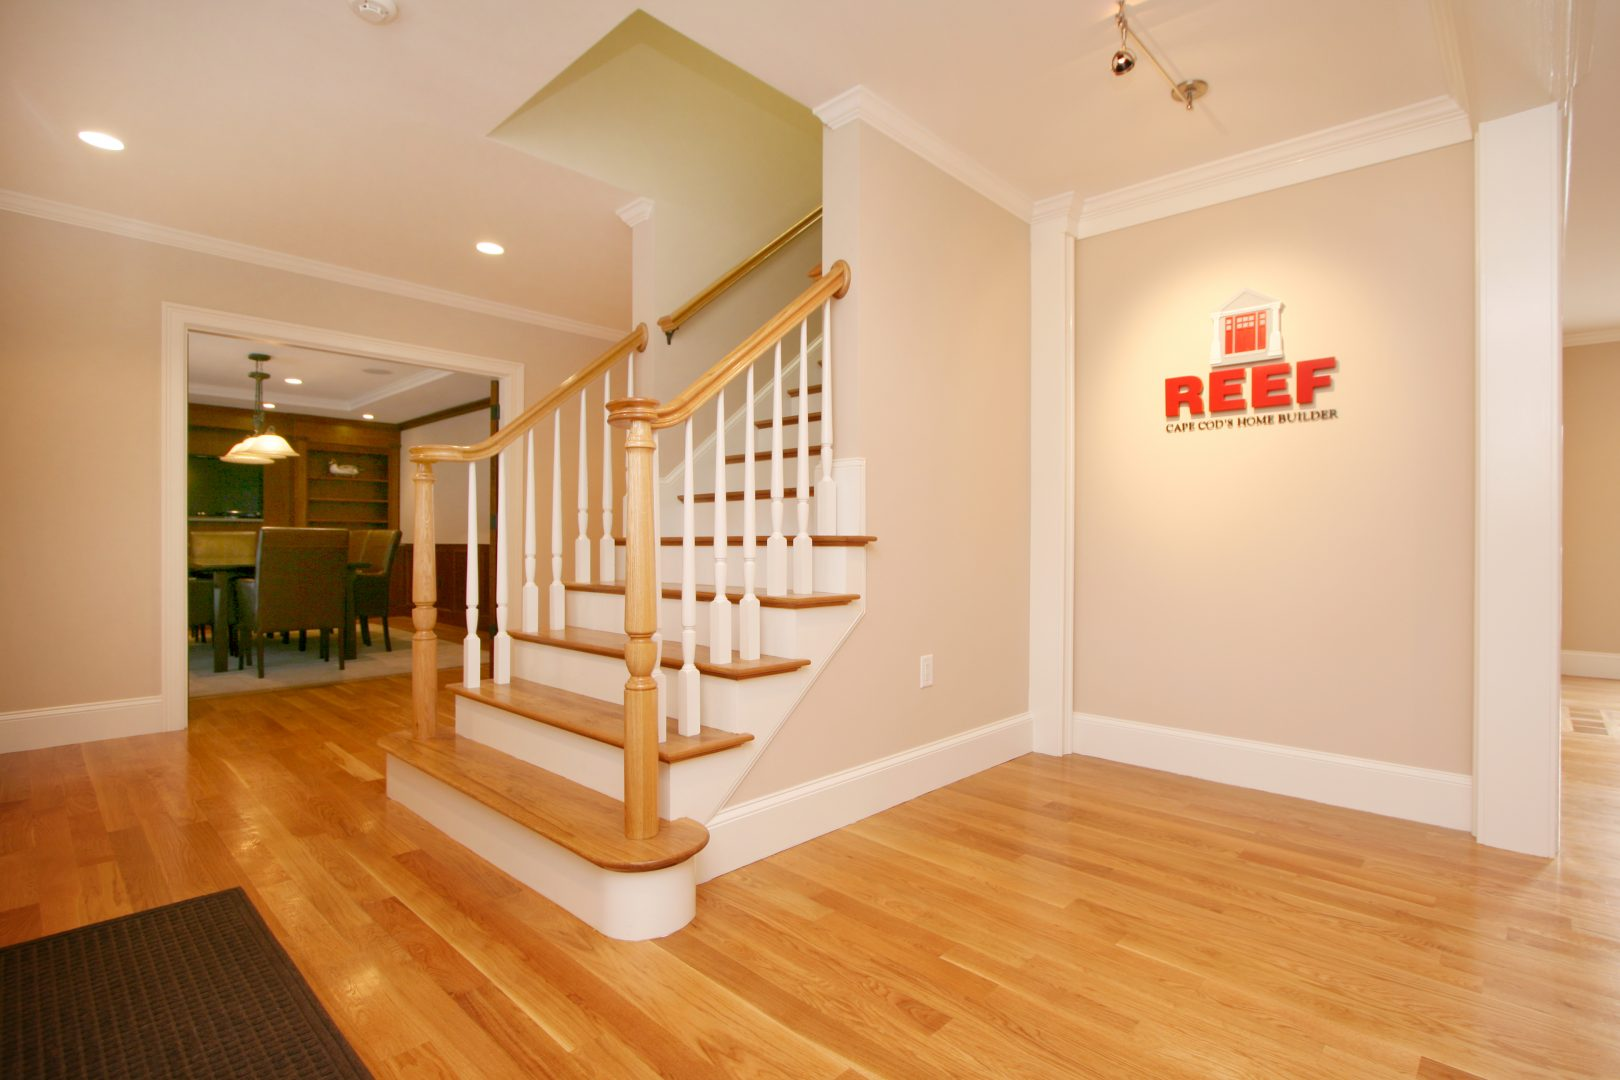 Cape Cod Builder, REEF, Custom Homes